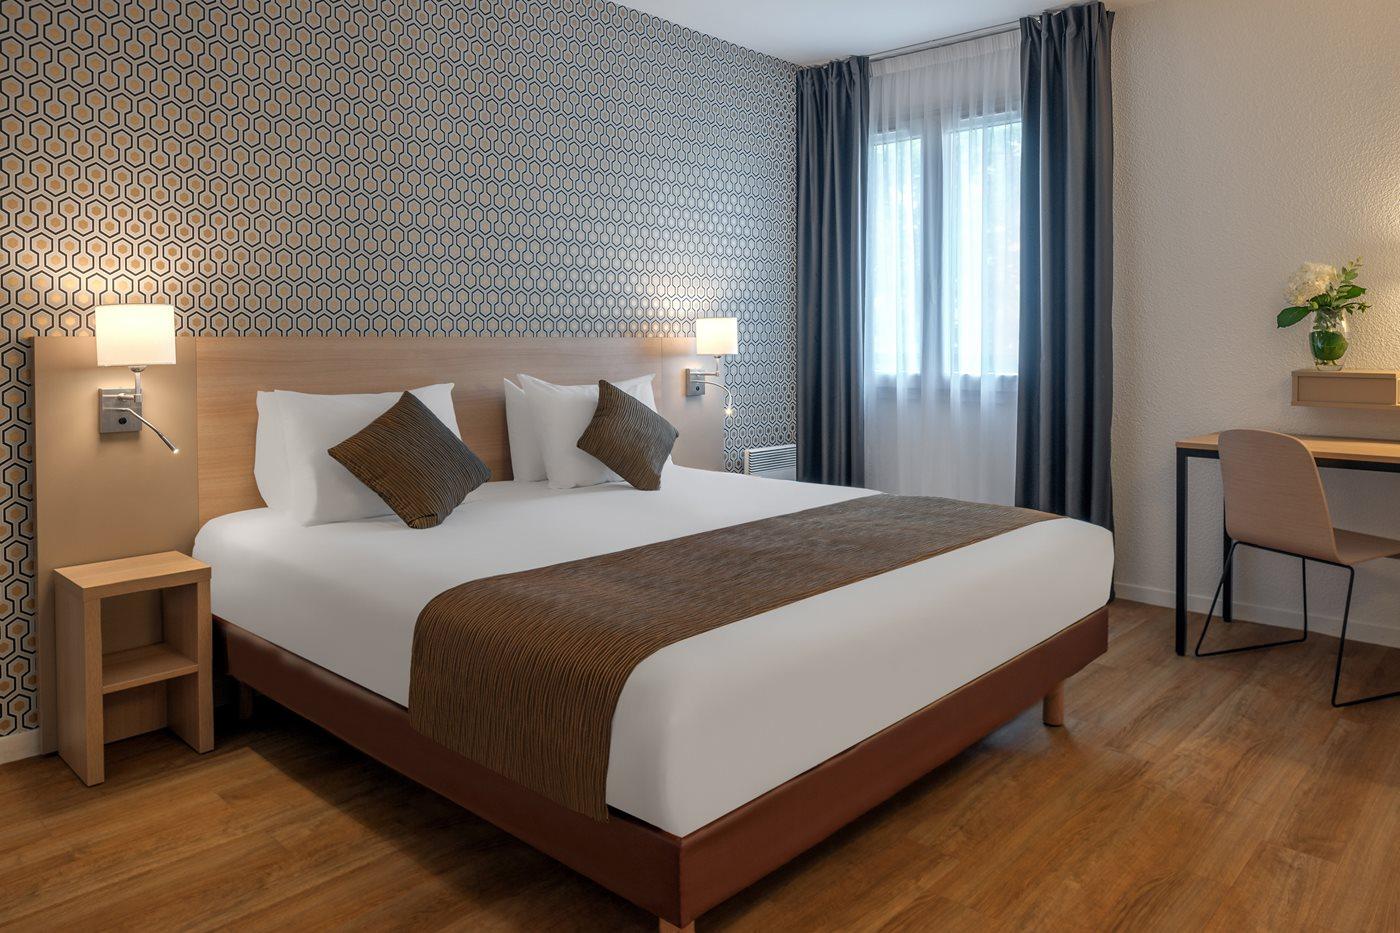 Chambres apart 39 hotel citadines bastille gare de lyon - Chambre d hote paris gare de lyon ...